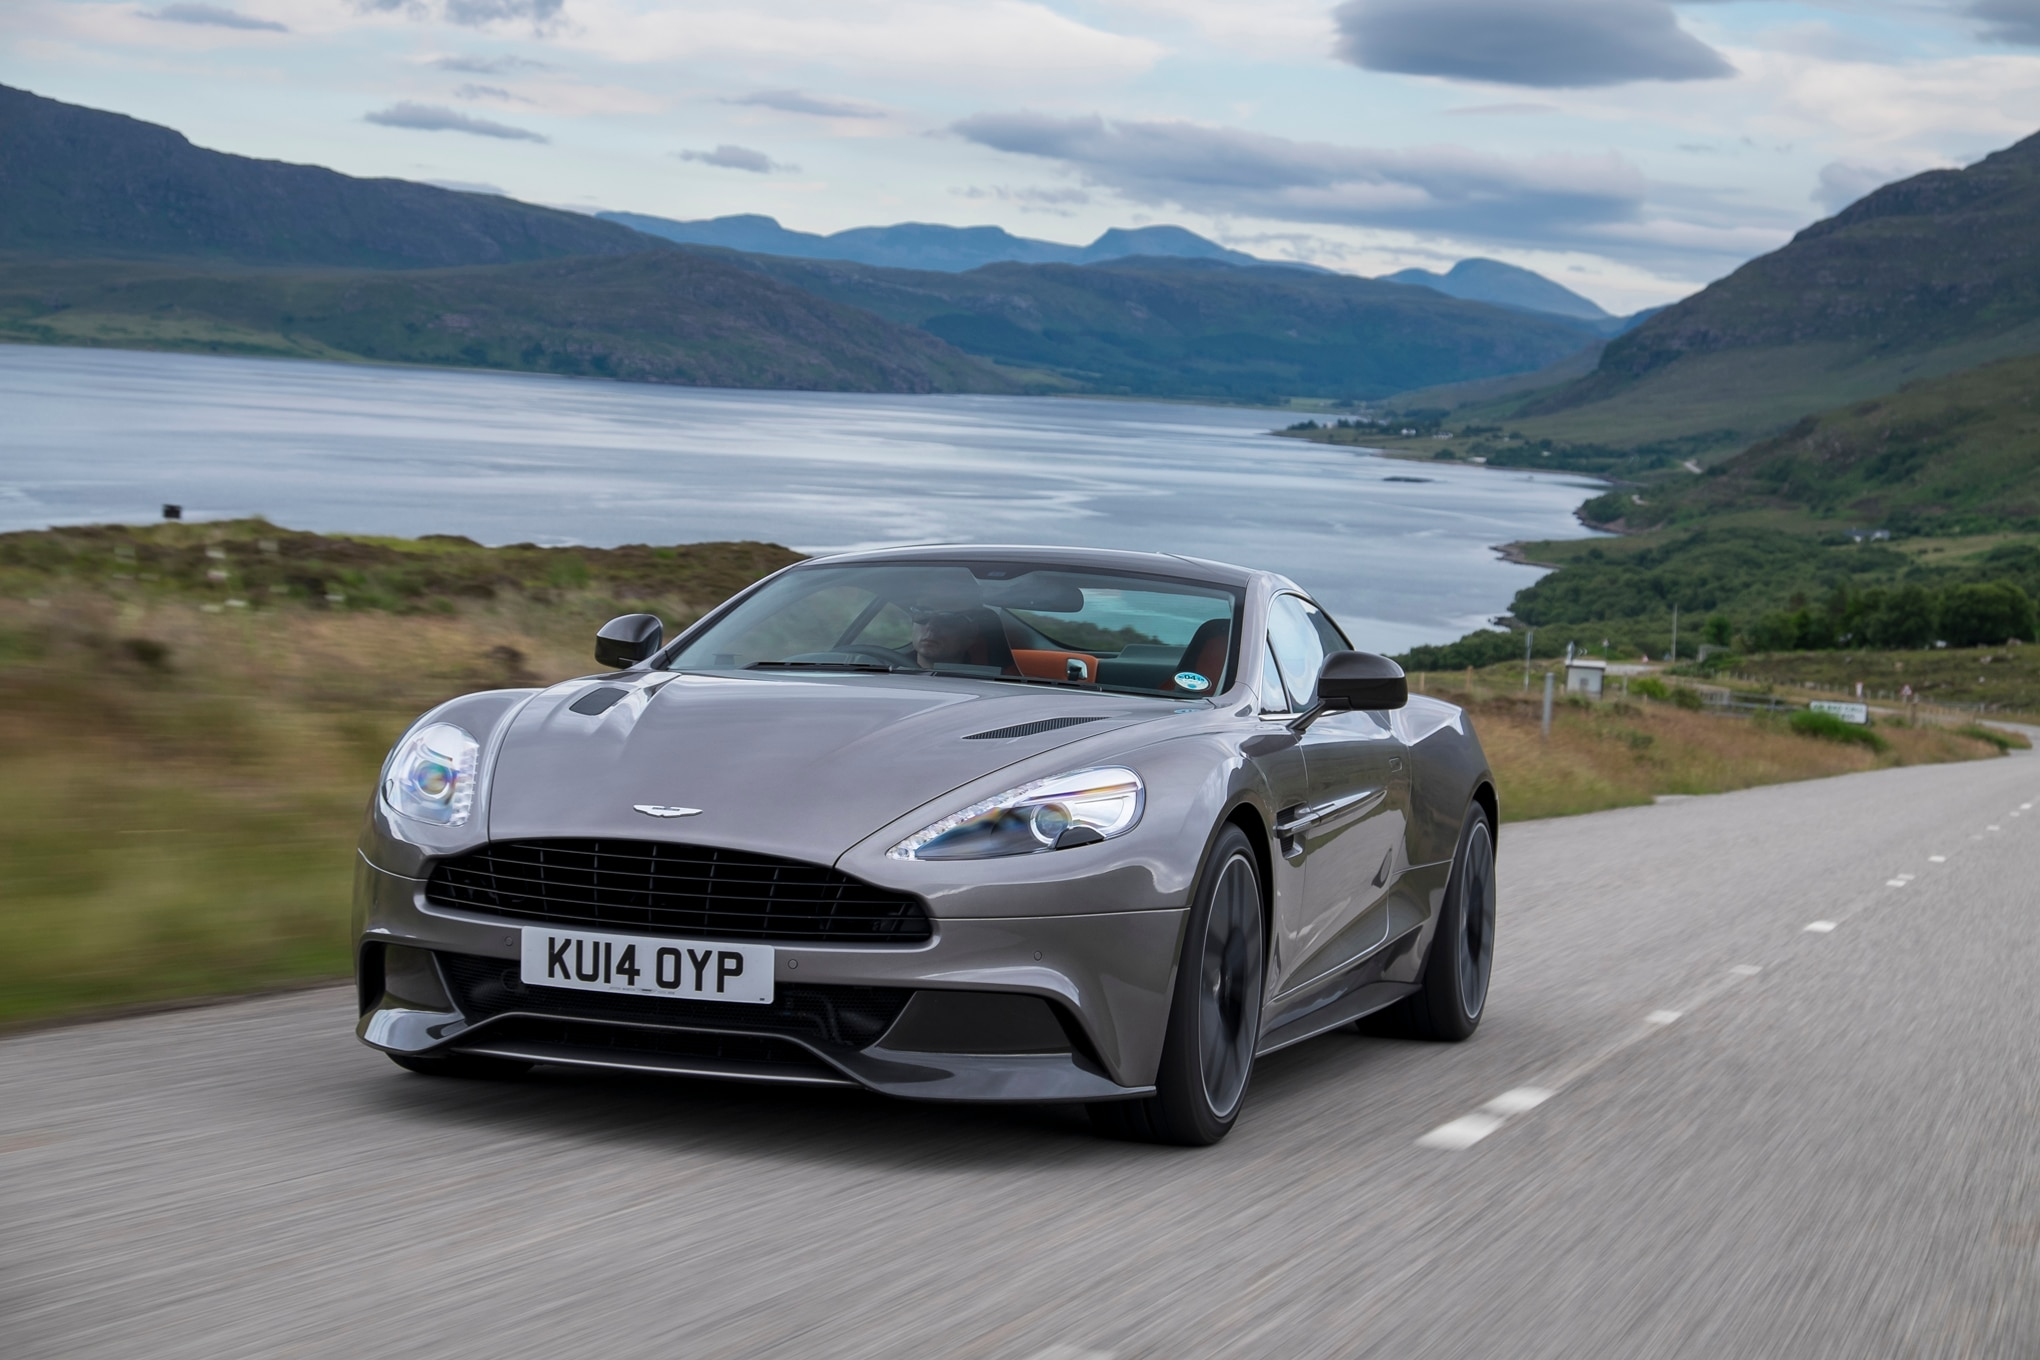 2015 Aston Martin Vanquish, Rapide S Review